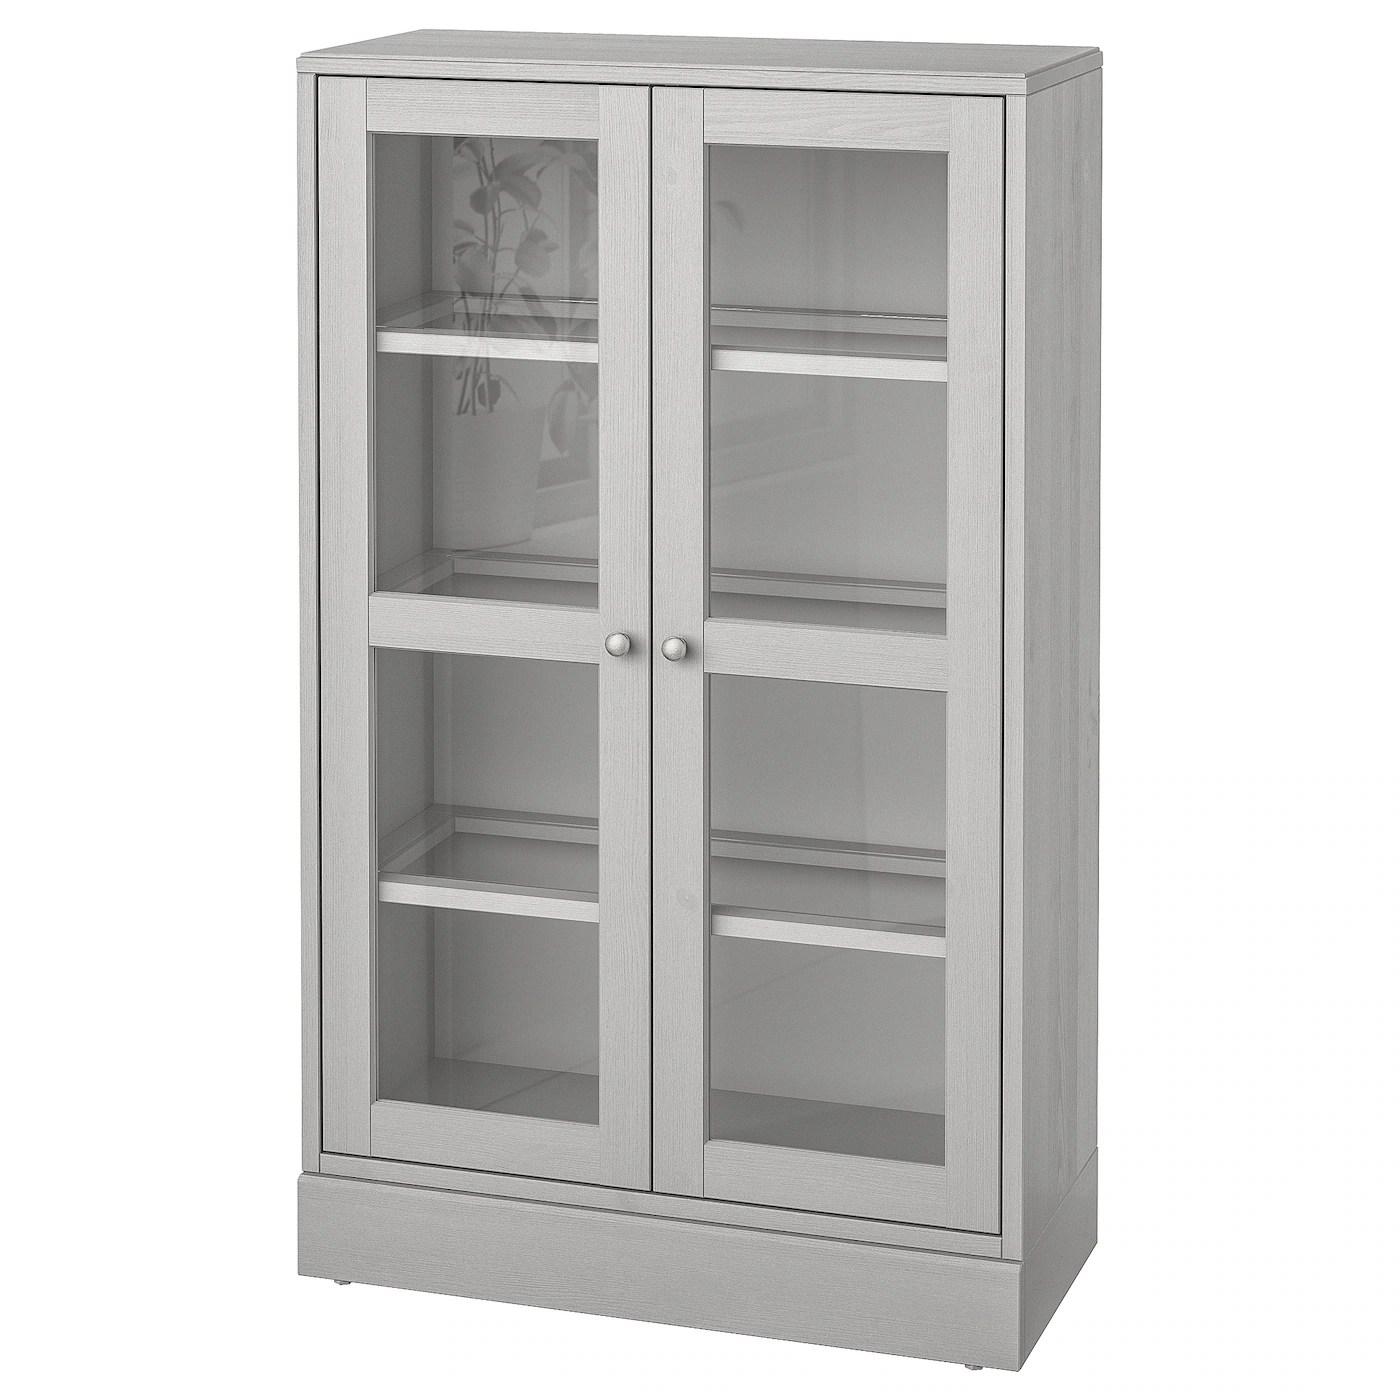 havsta vitrine mit sockel grau klarglas 81x37x134 cm